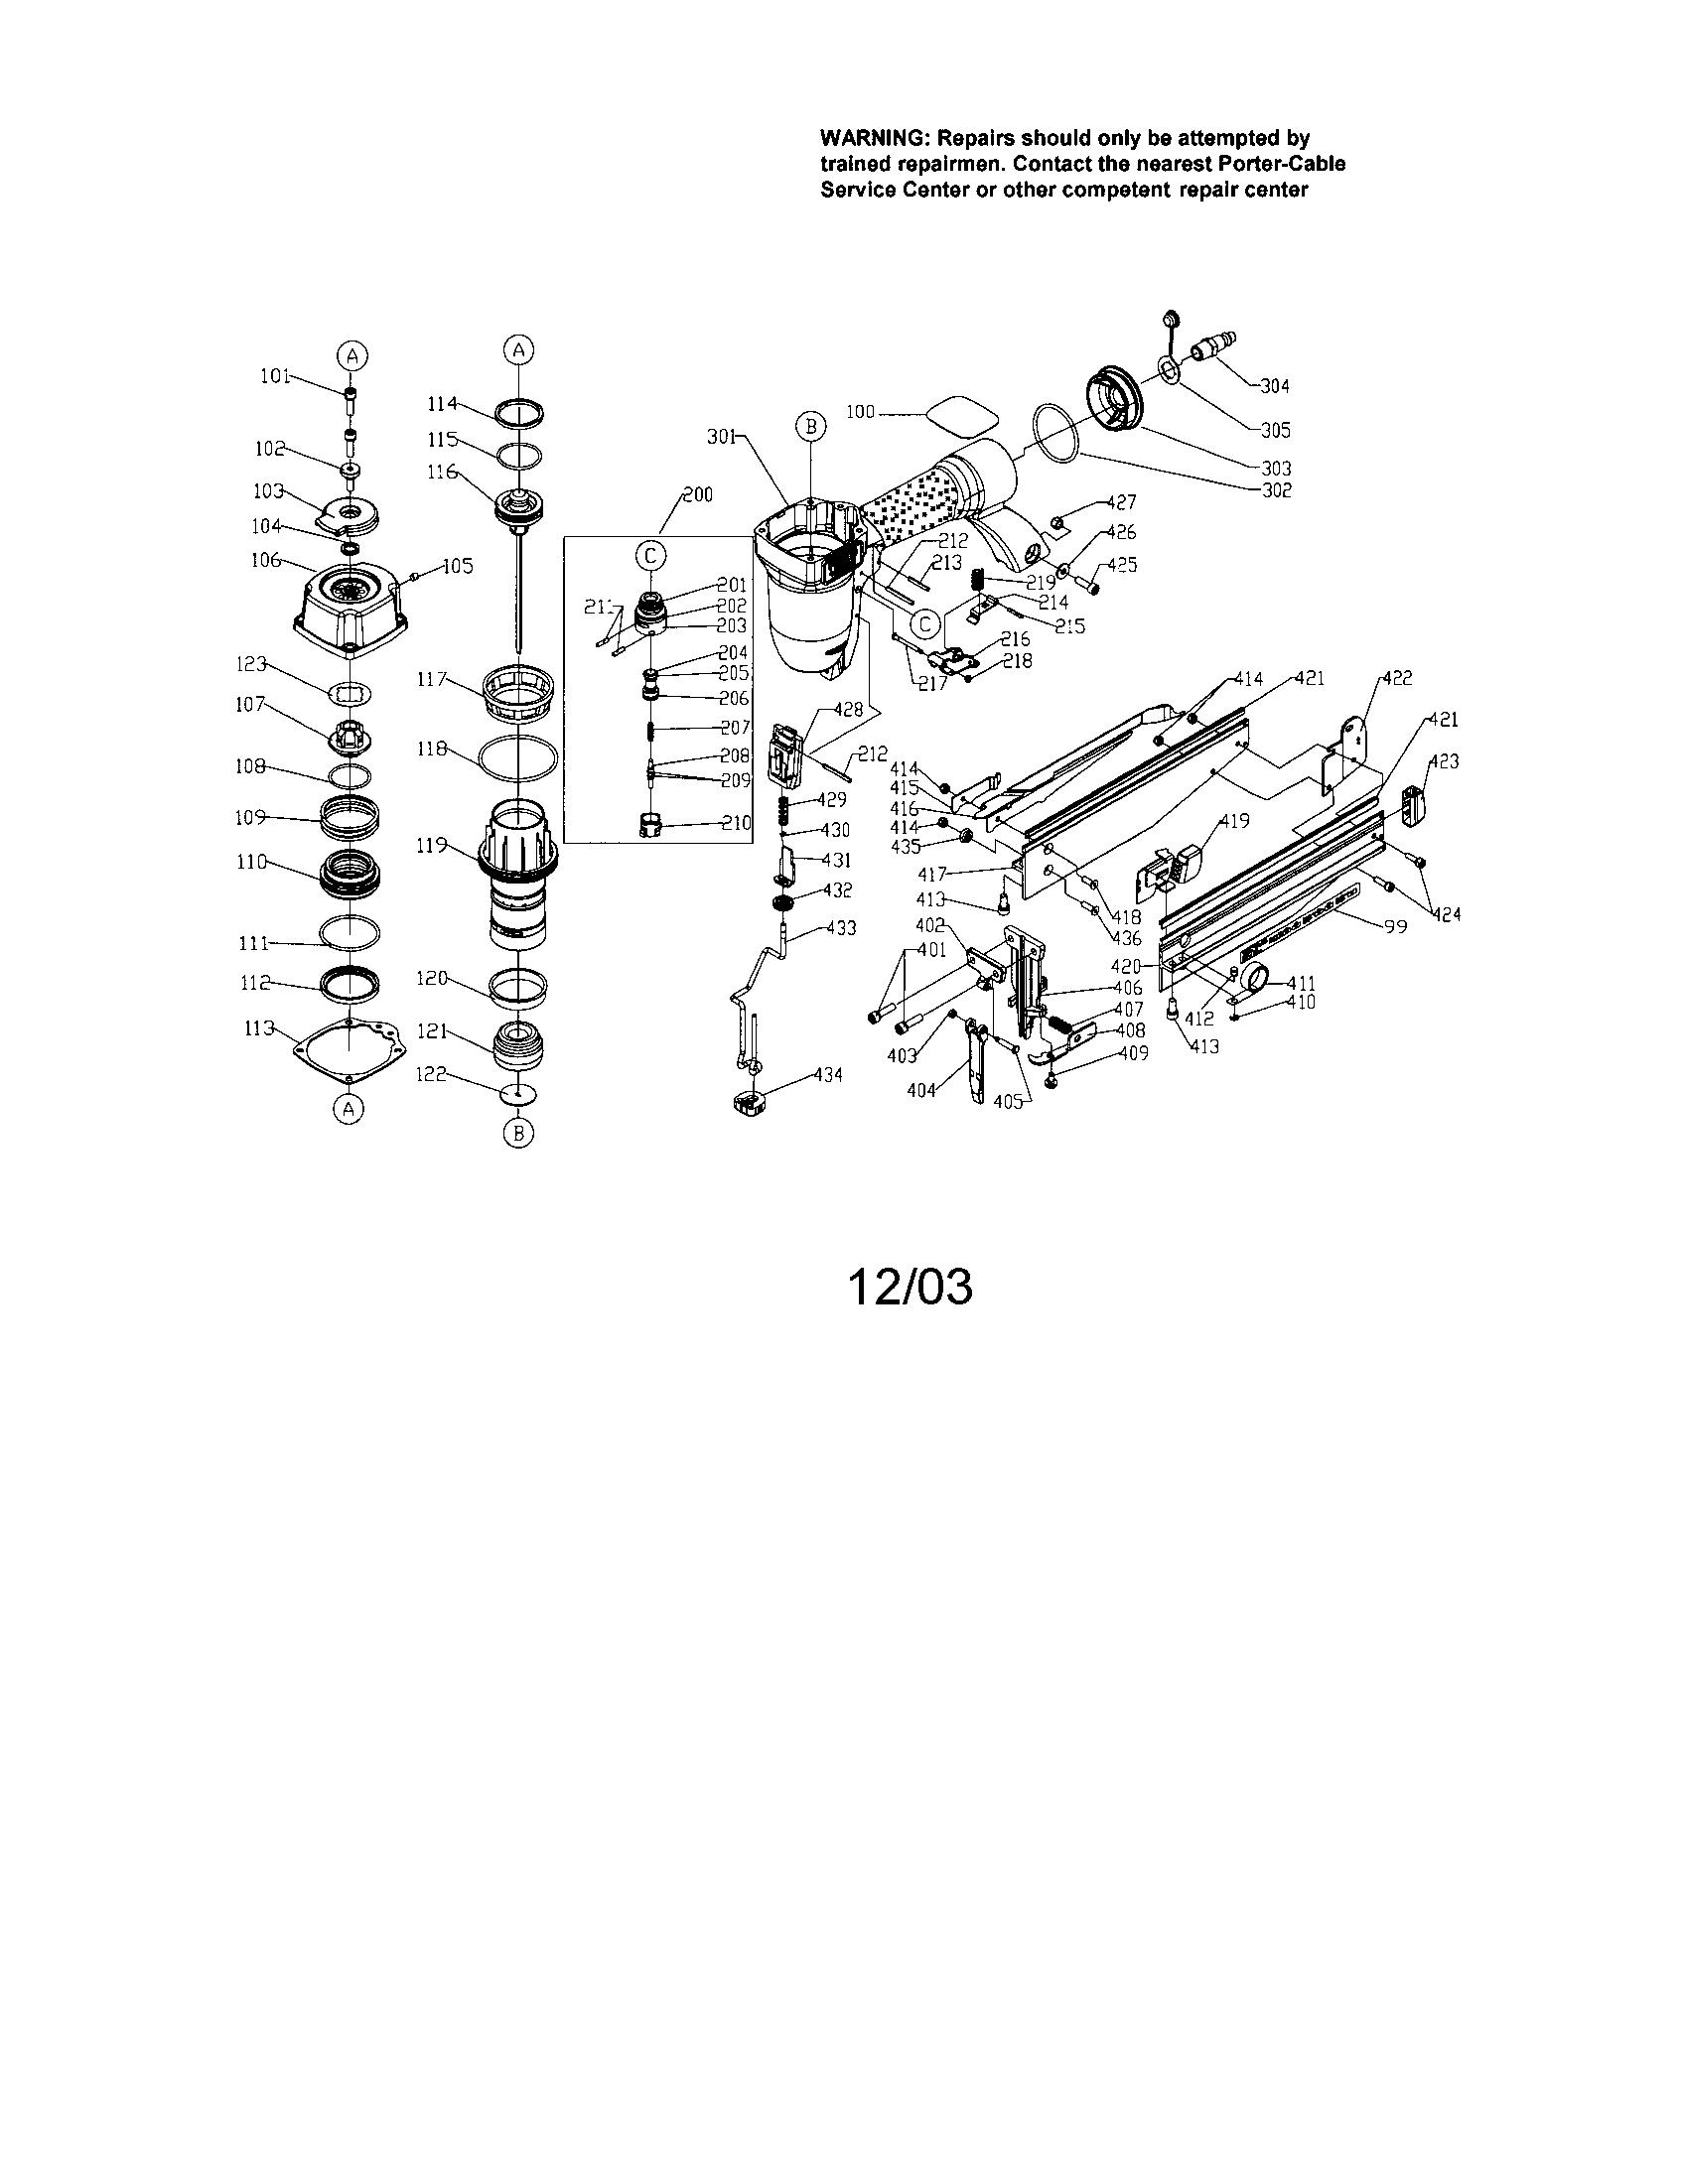 FINISH NAILER Diagram & Parts List for Model fn250b Porter